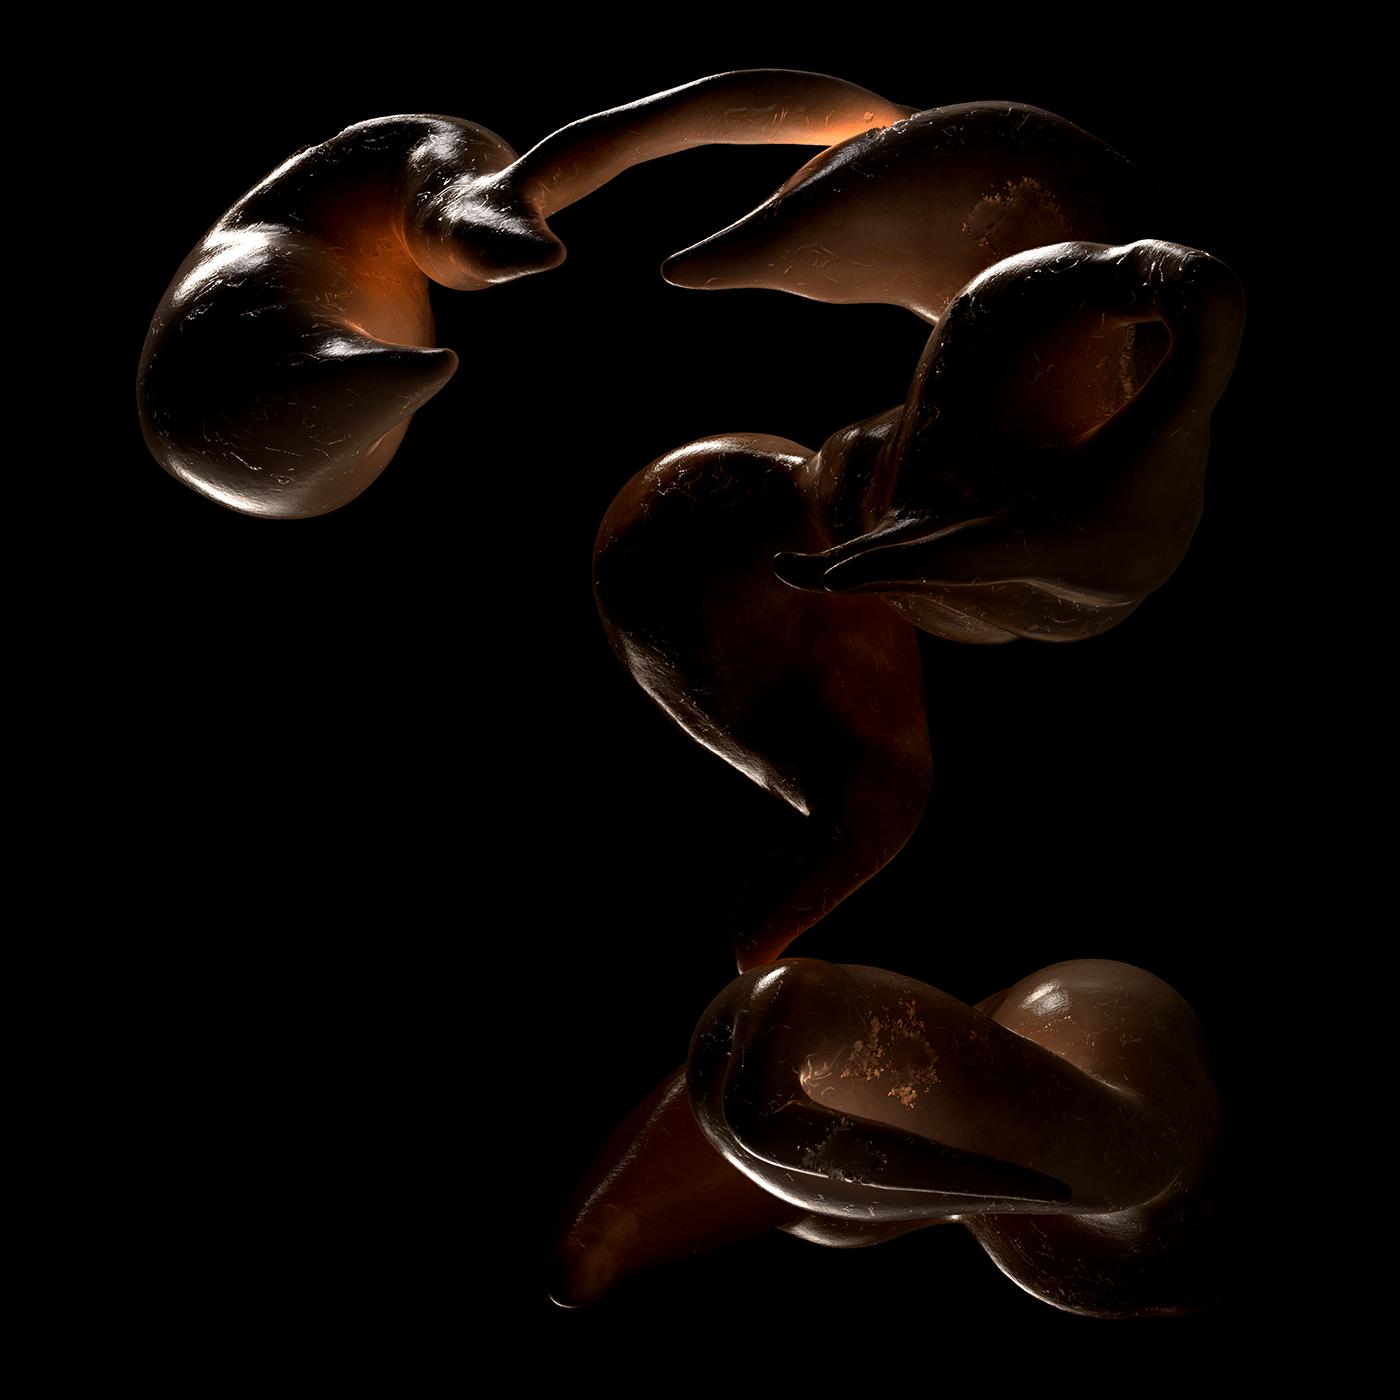 abstract cinema4d crab fish muzzle Ocean porcelain redshift sculpture